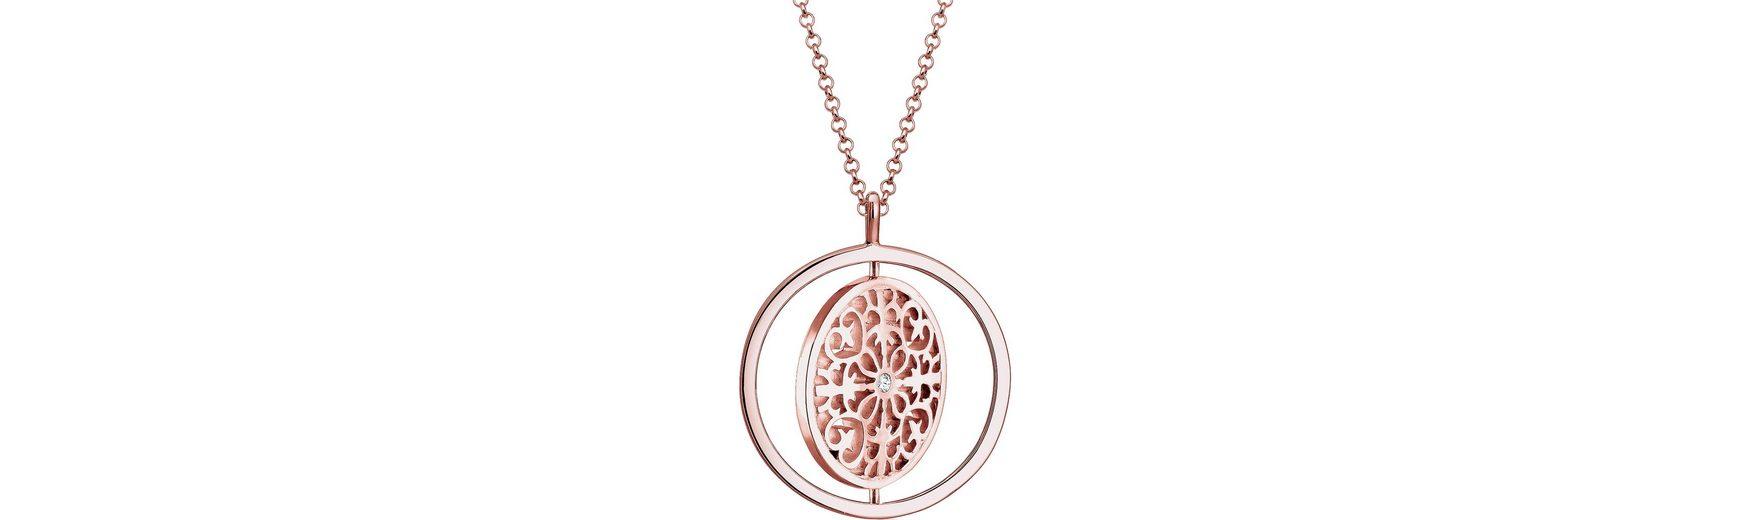 Elli Premium Kette mit Anhänger »Ornament, Elli PREMIUM, 0103141816« mit Swarovski® Kristall